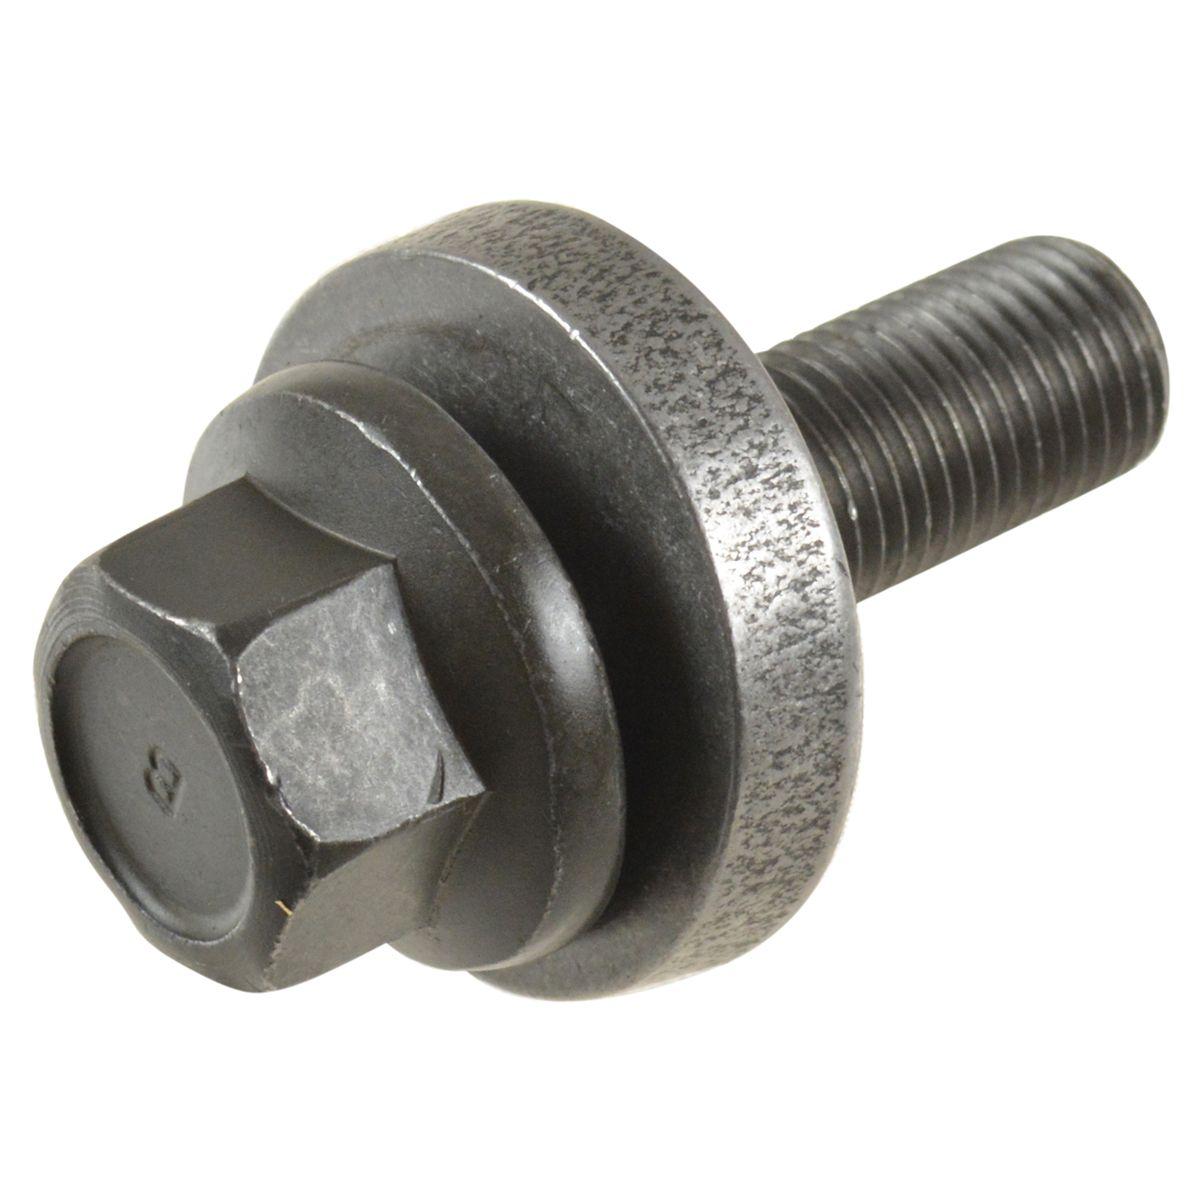 OEM Crankshaft Pulley Lock Bolt /& Washer for Mazda CX-7 Miata Pickup Tribute New